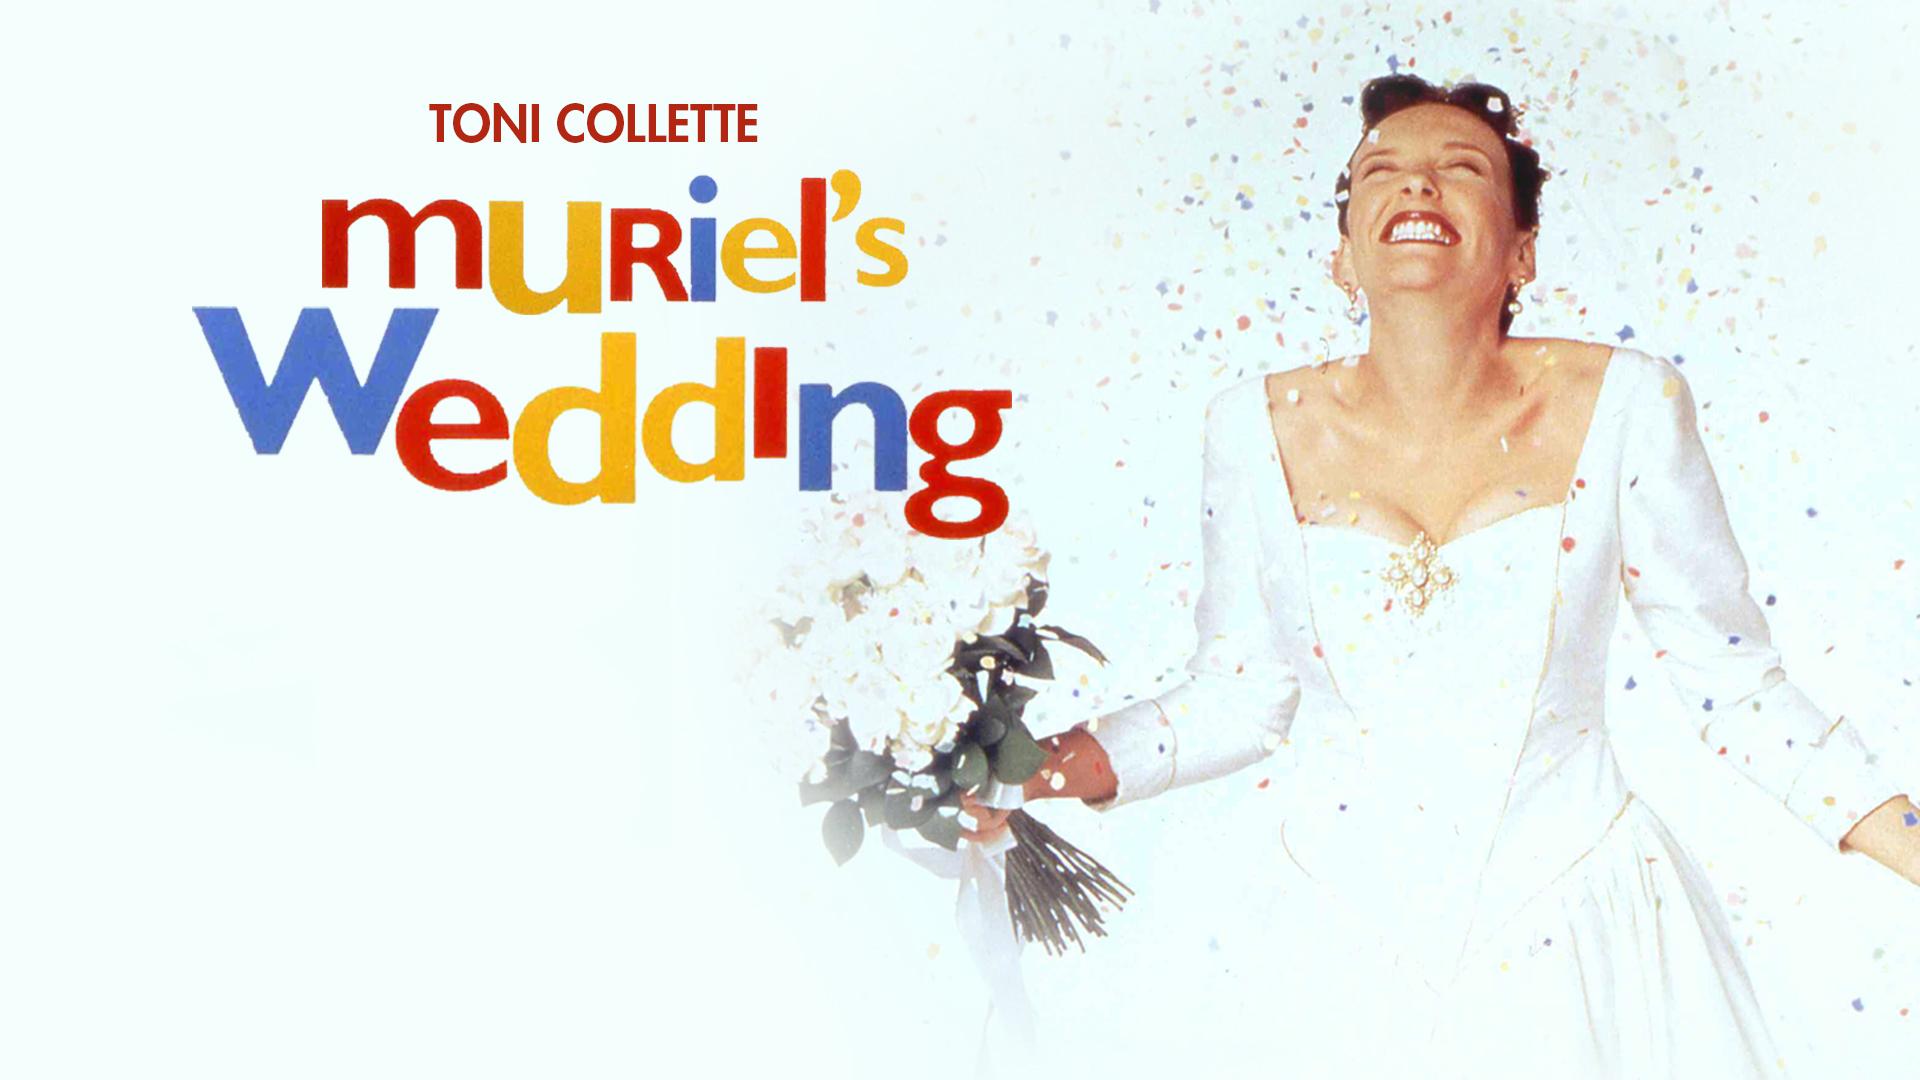 Muriel's Wedding